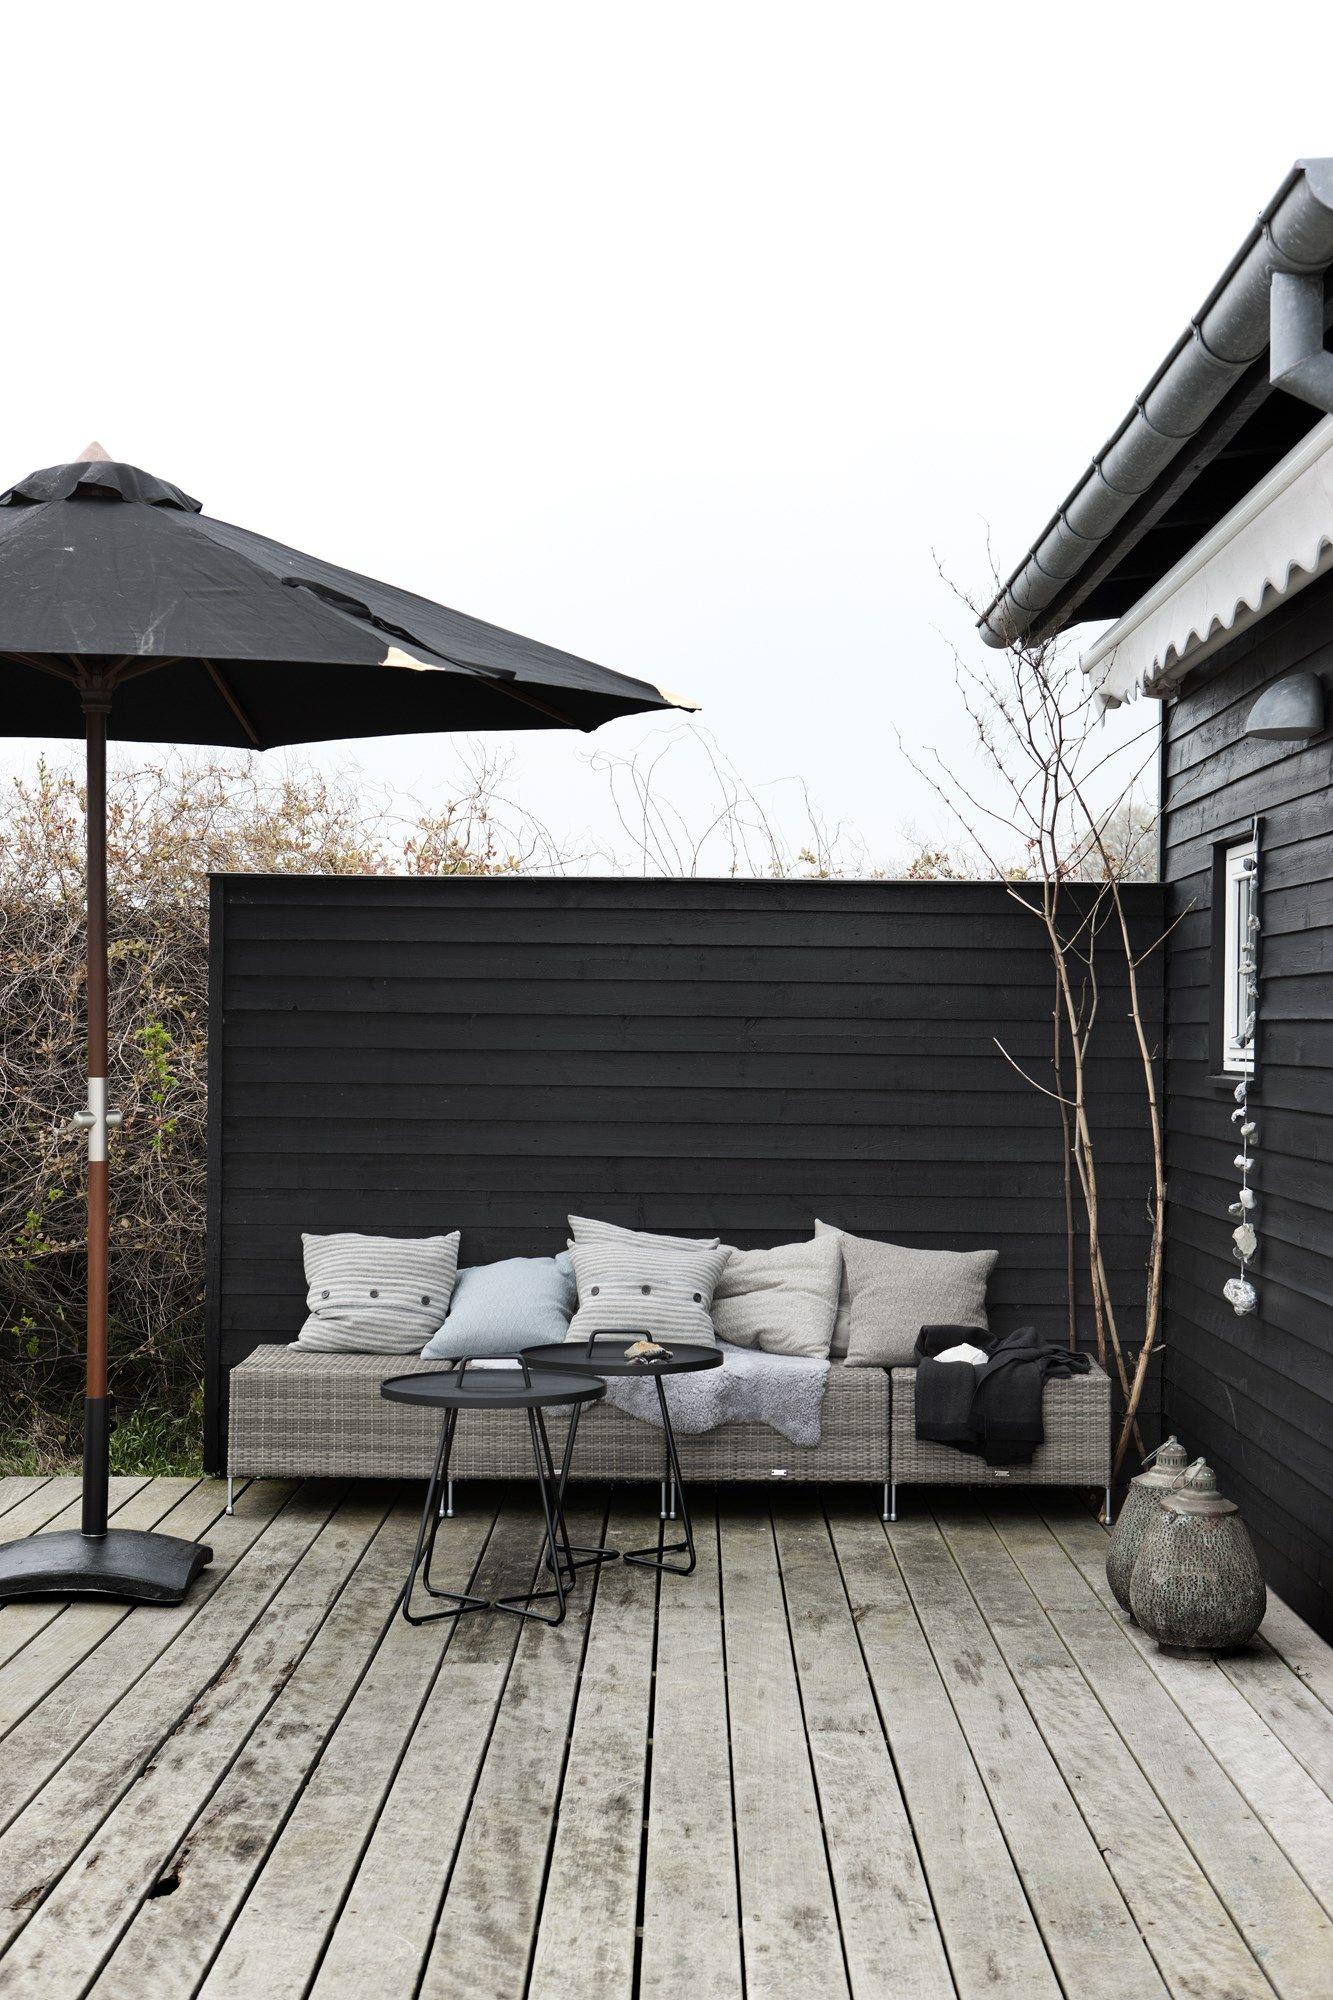 pin von liisa pin auf summerhouse | pinterest, Gartengerate ideen